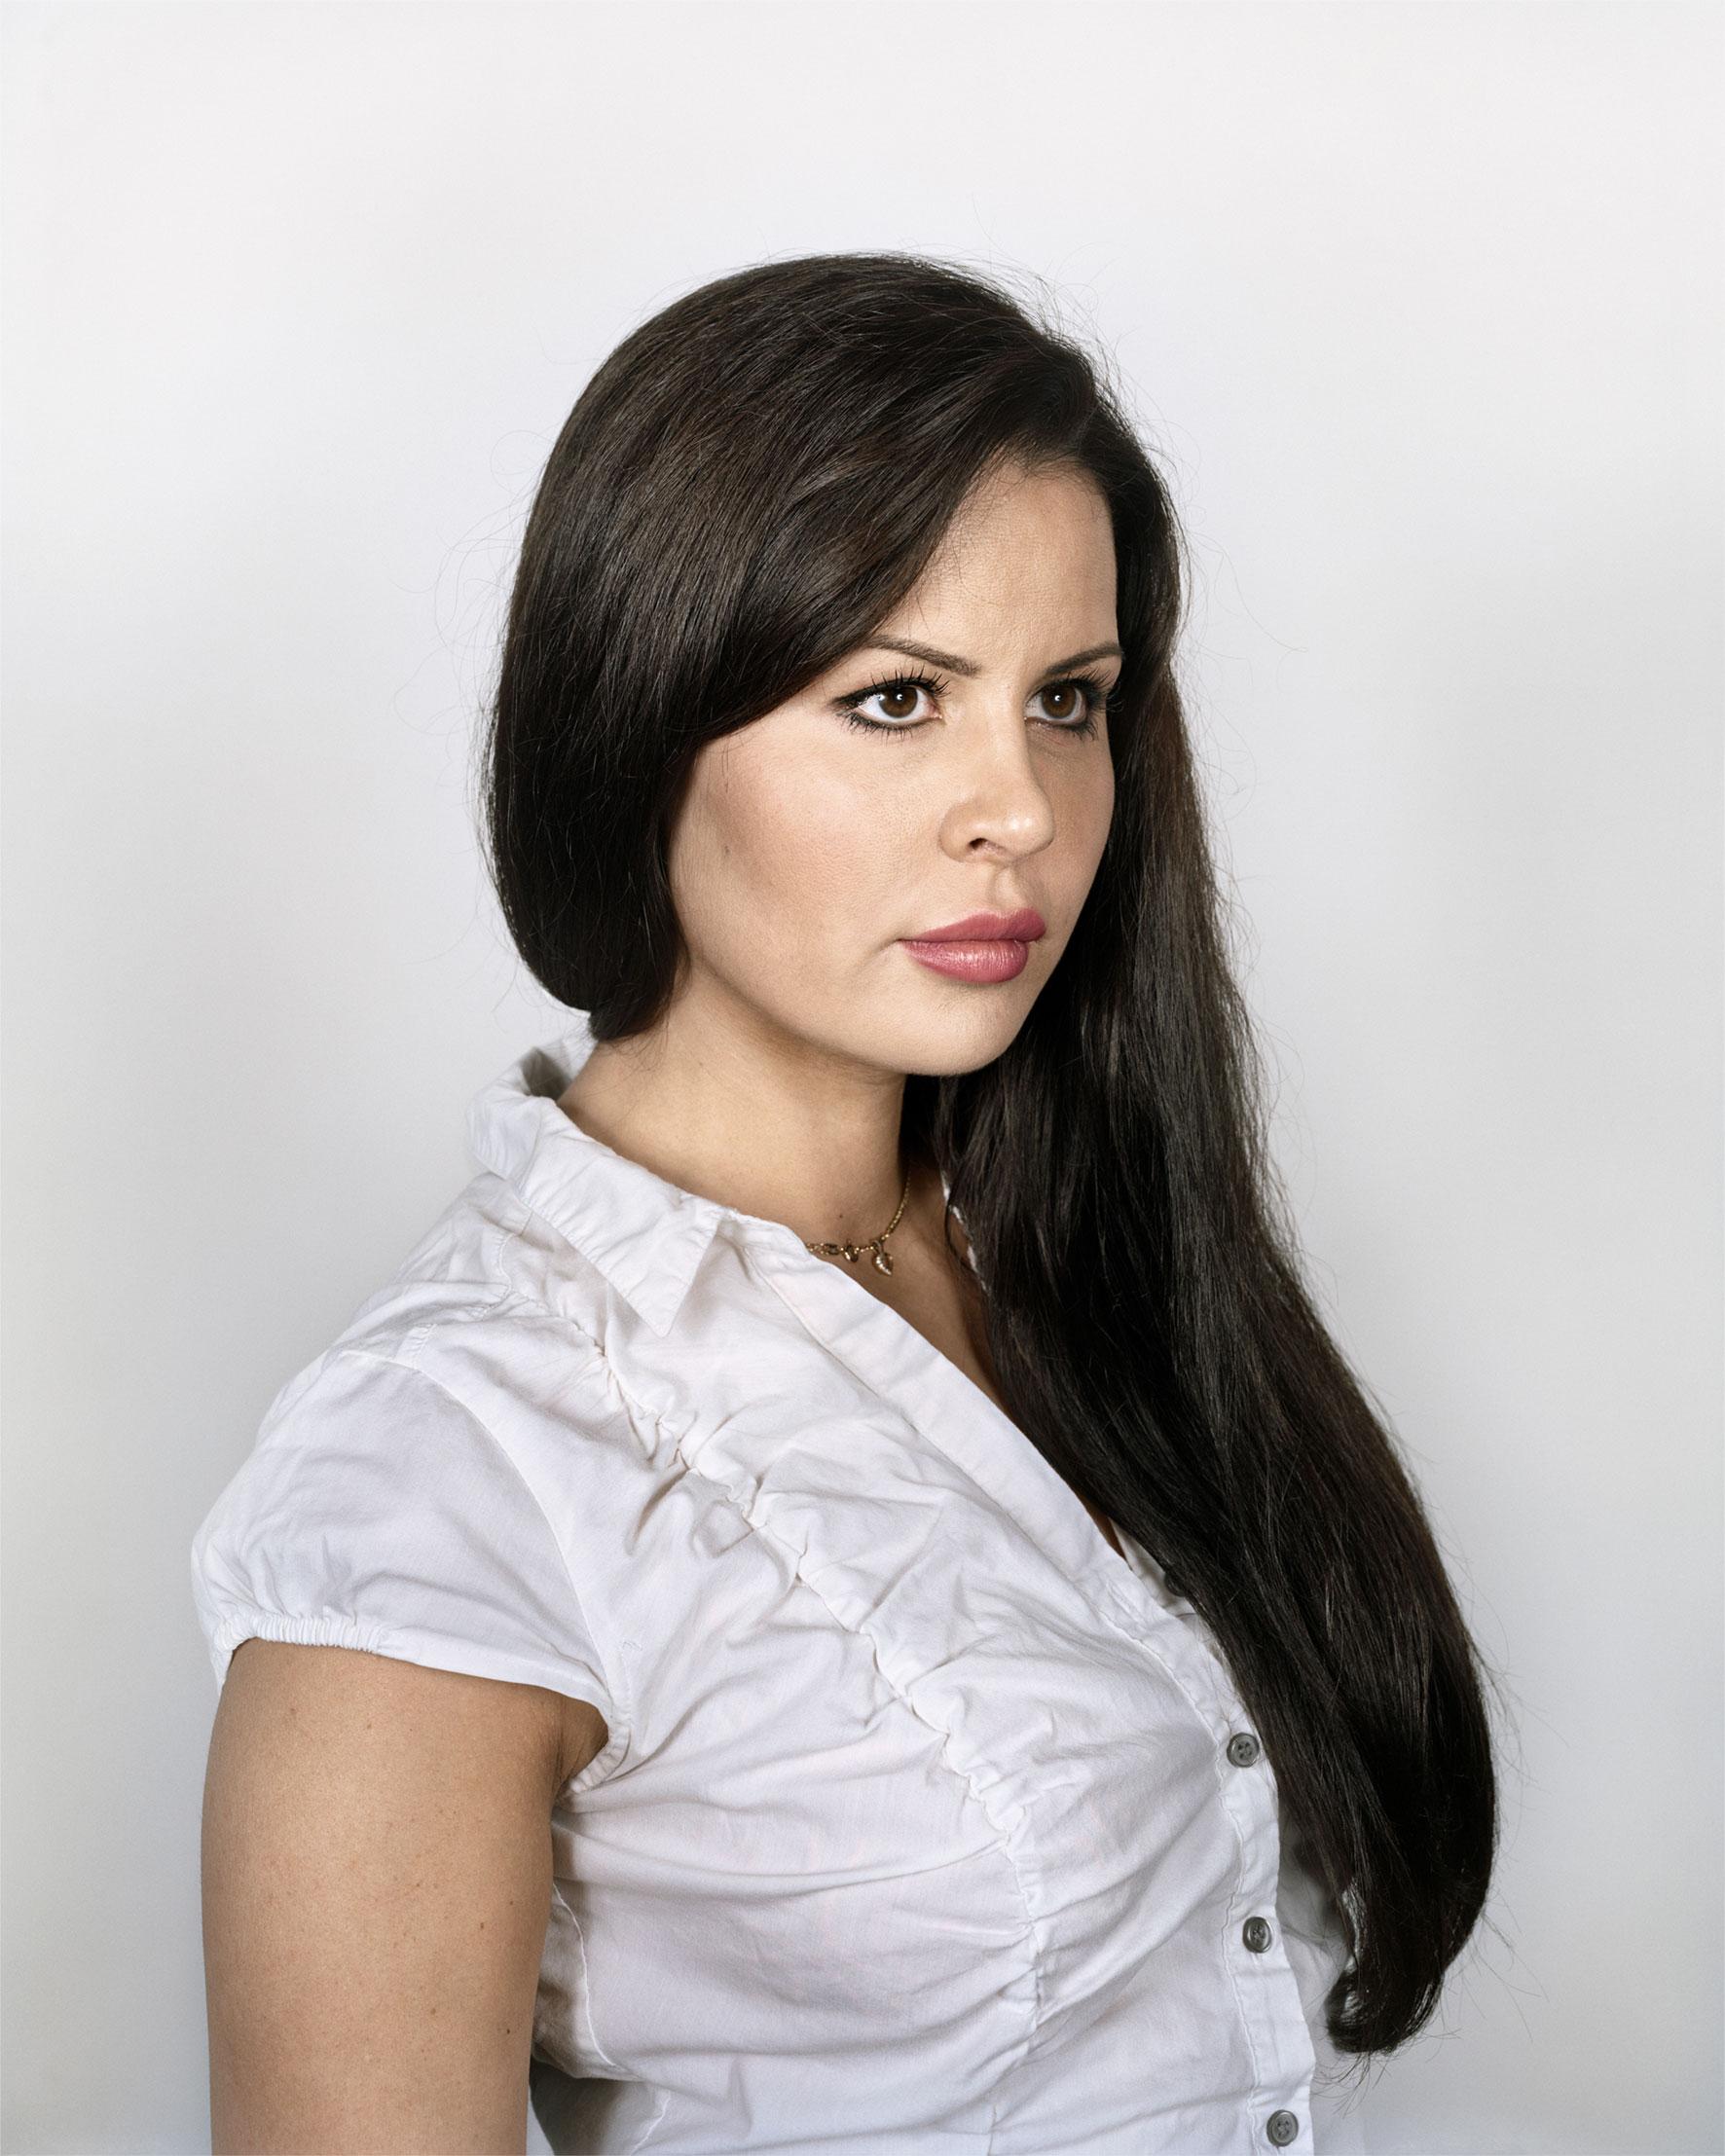 Lady Lana